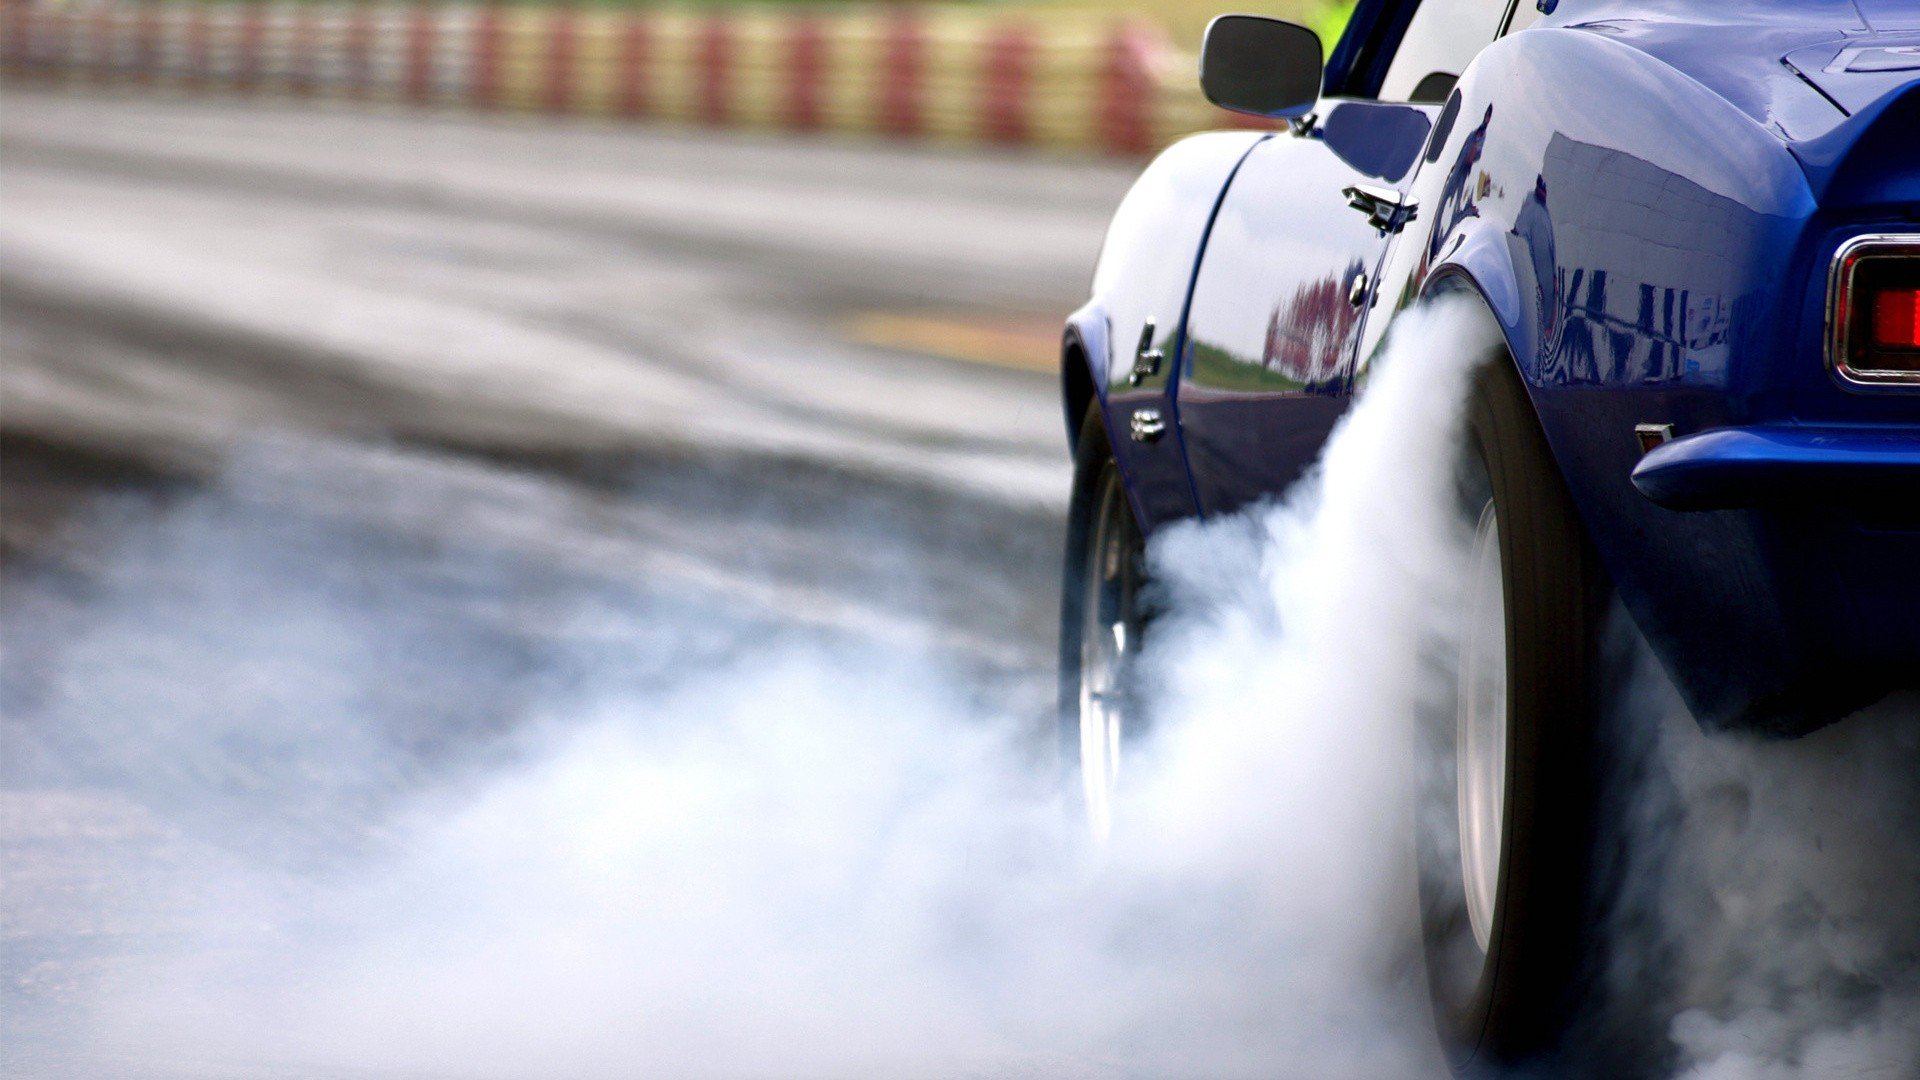 Cars Smoke Vehicles Burnout Wallpaper